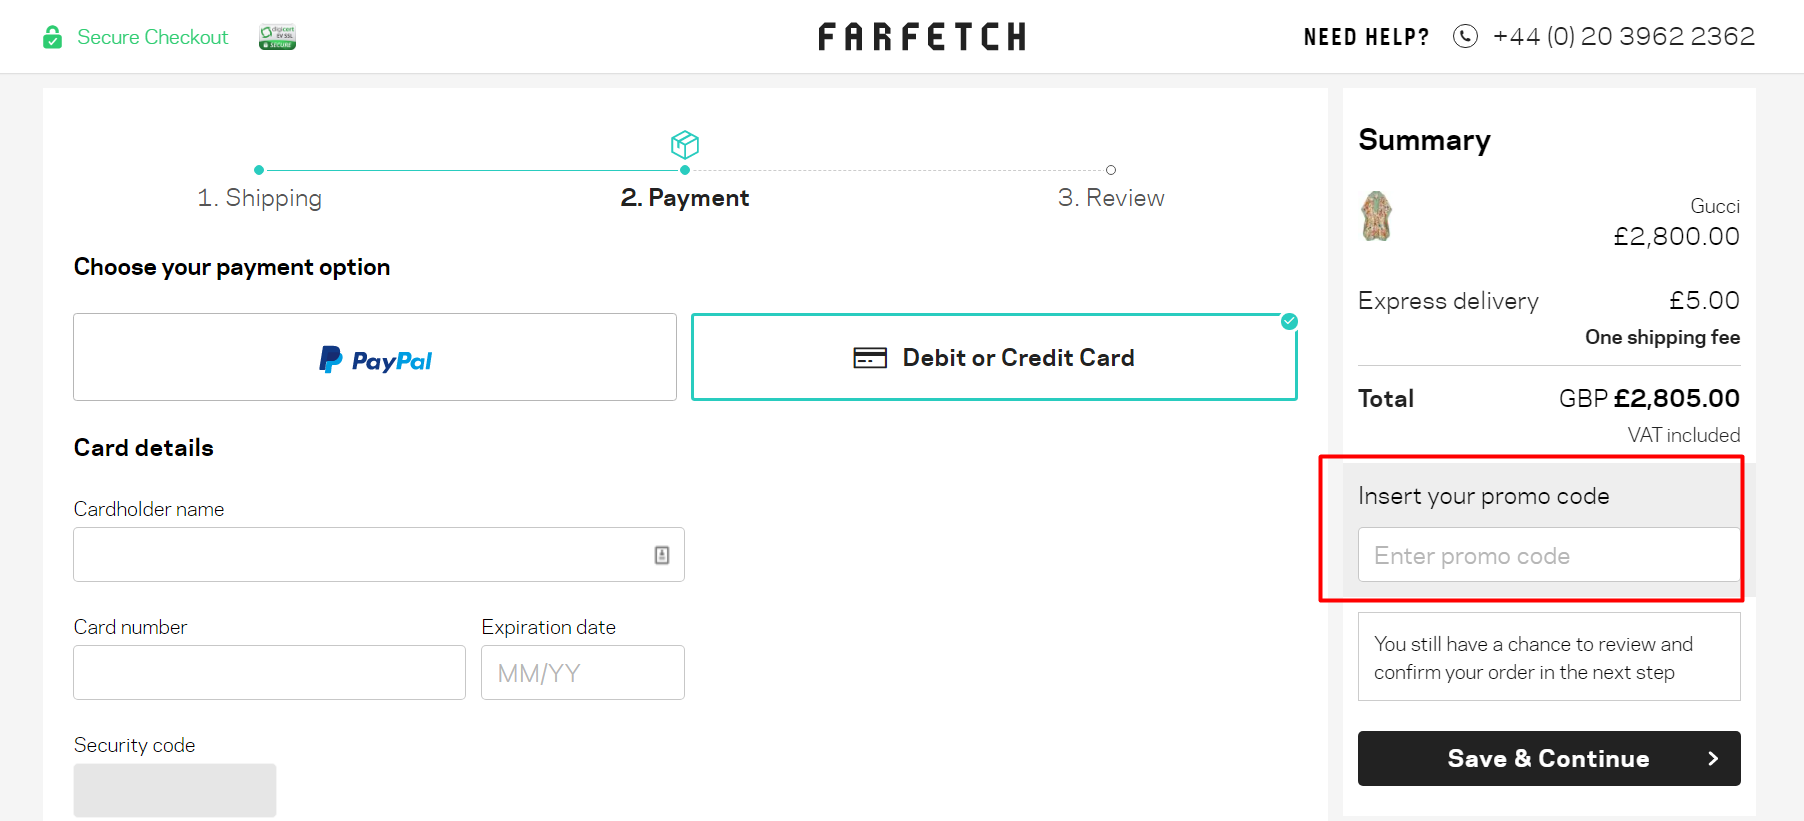 How do I use my Farfetch discount code?